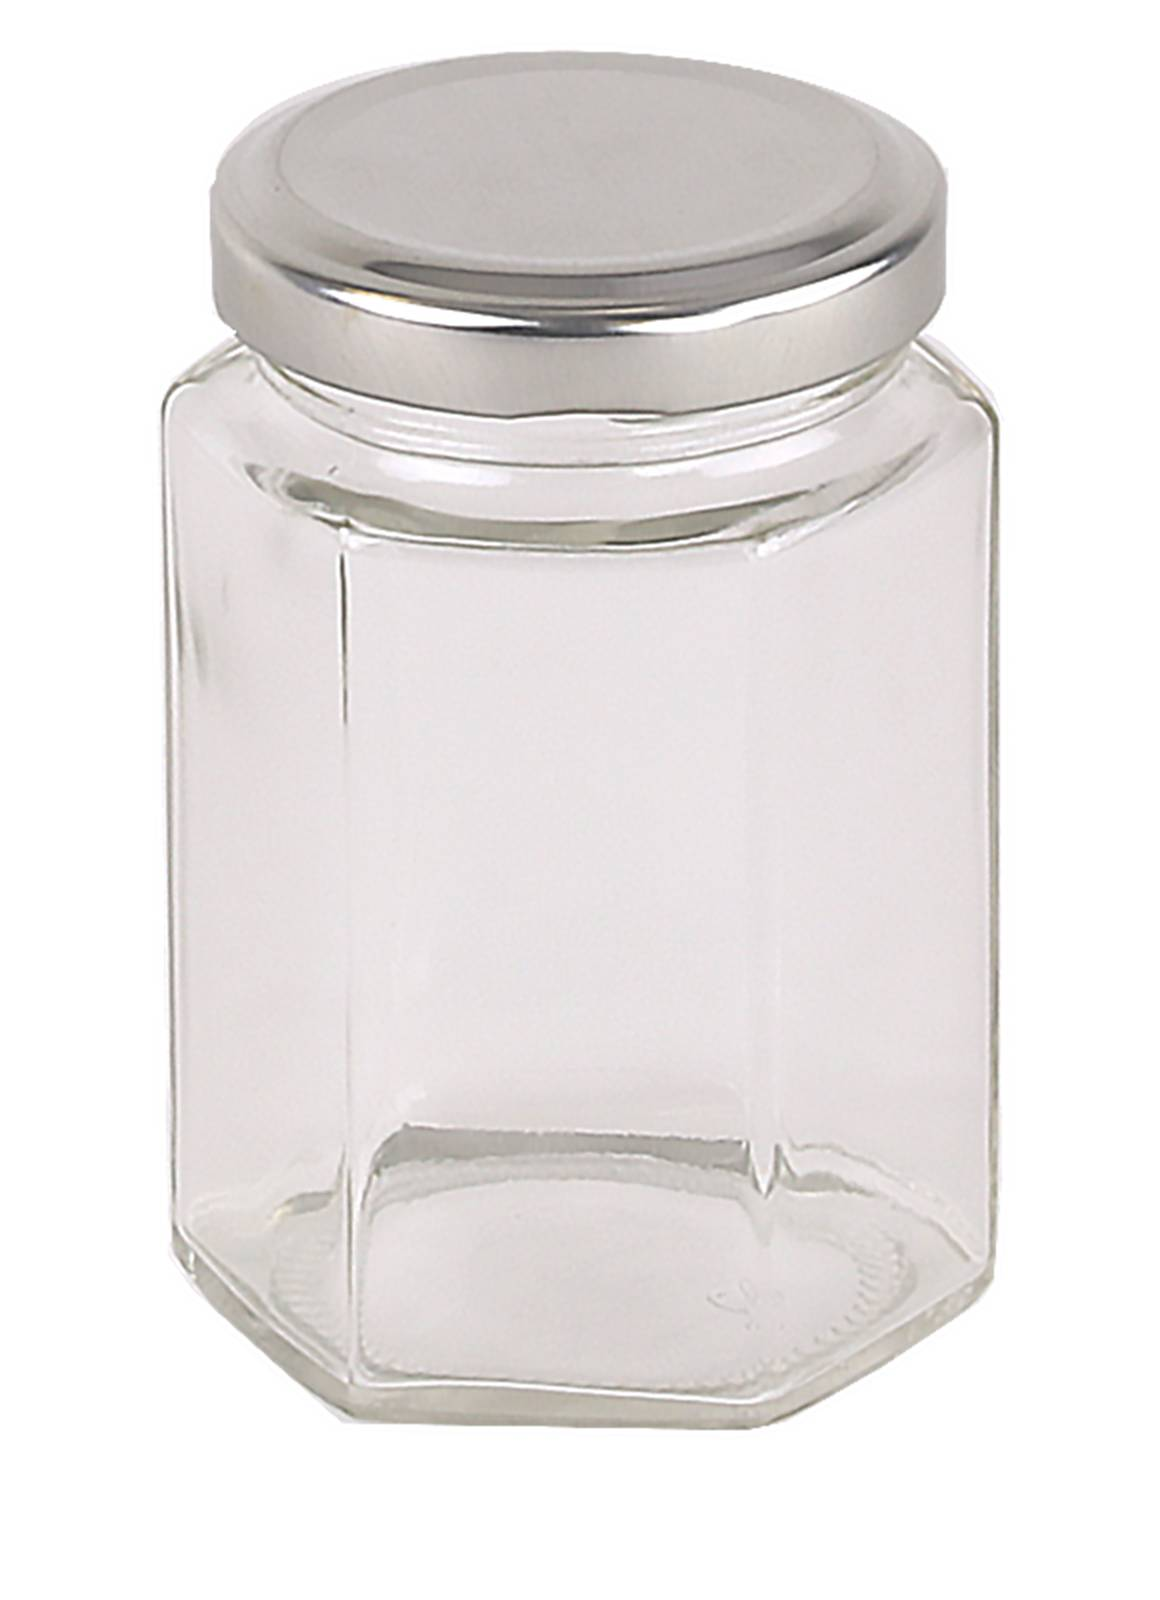 FREE Glass jar sample pack